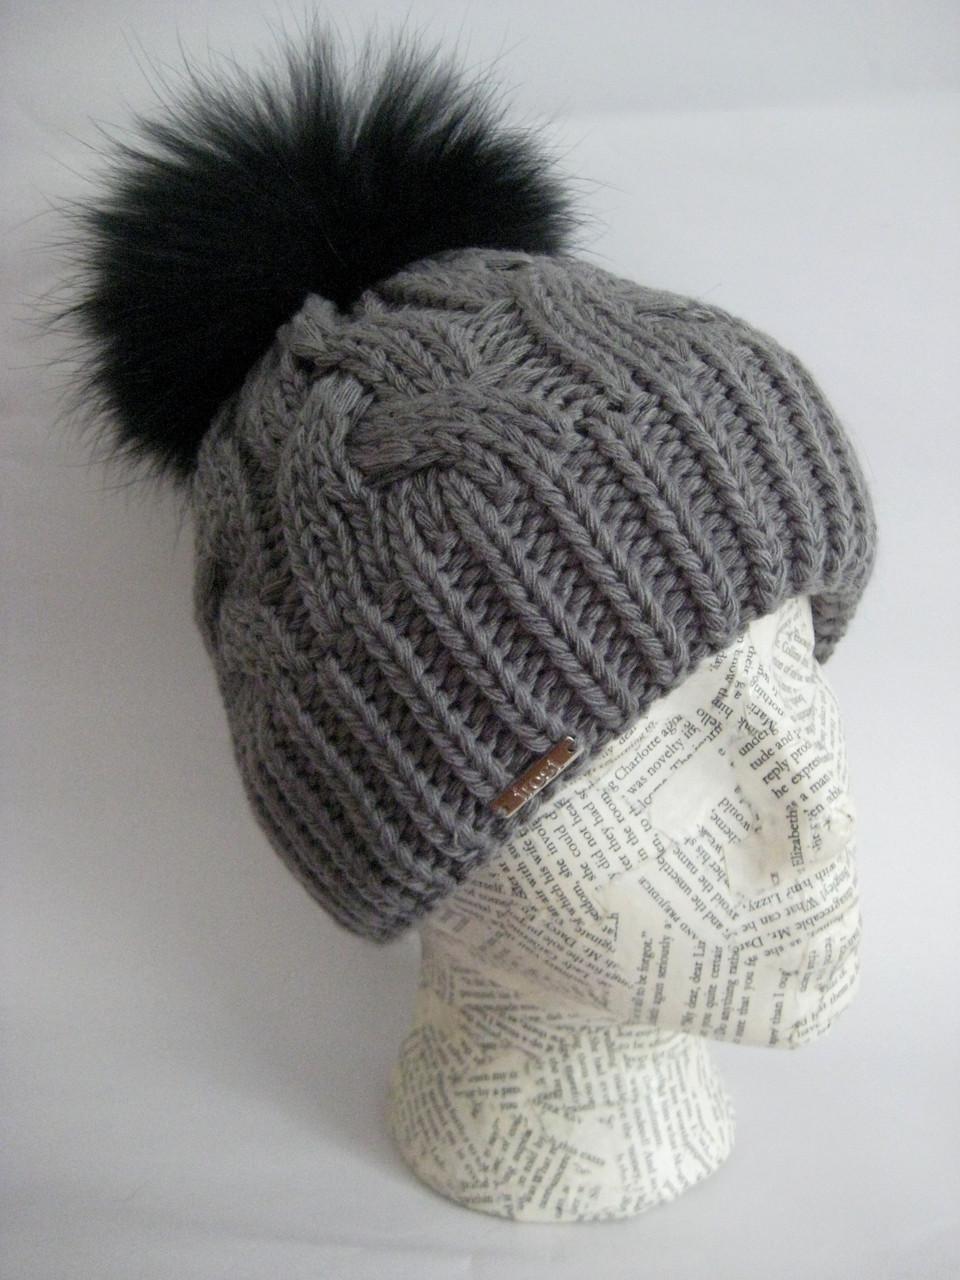 4d17270c Winter hat for women  Classic cable knit beanie  Fox fur pom pom hat